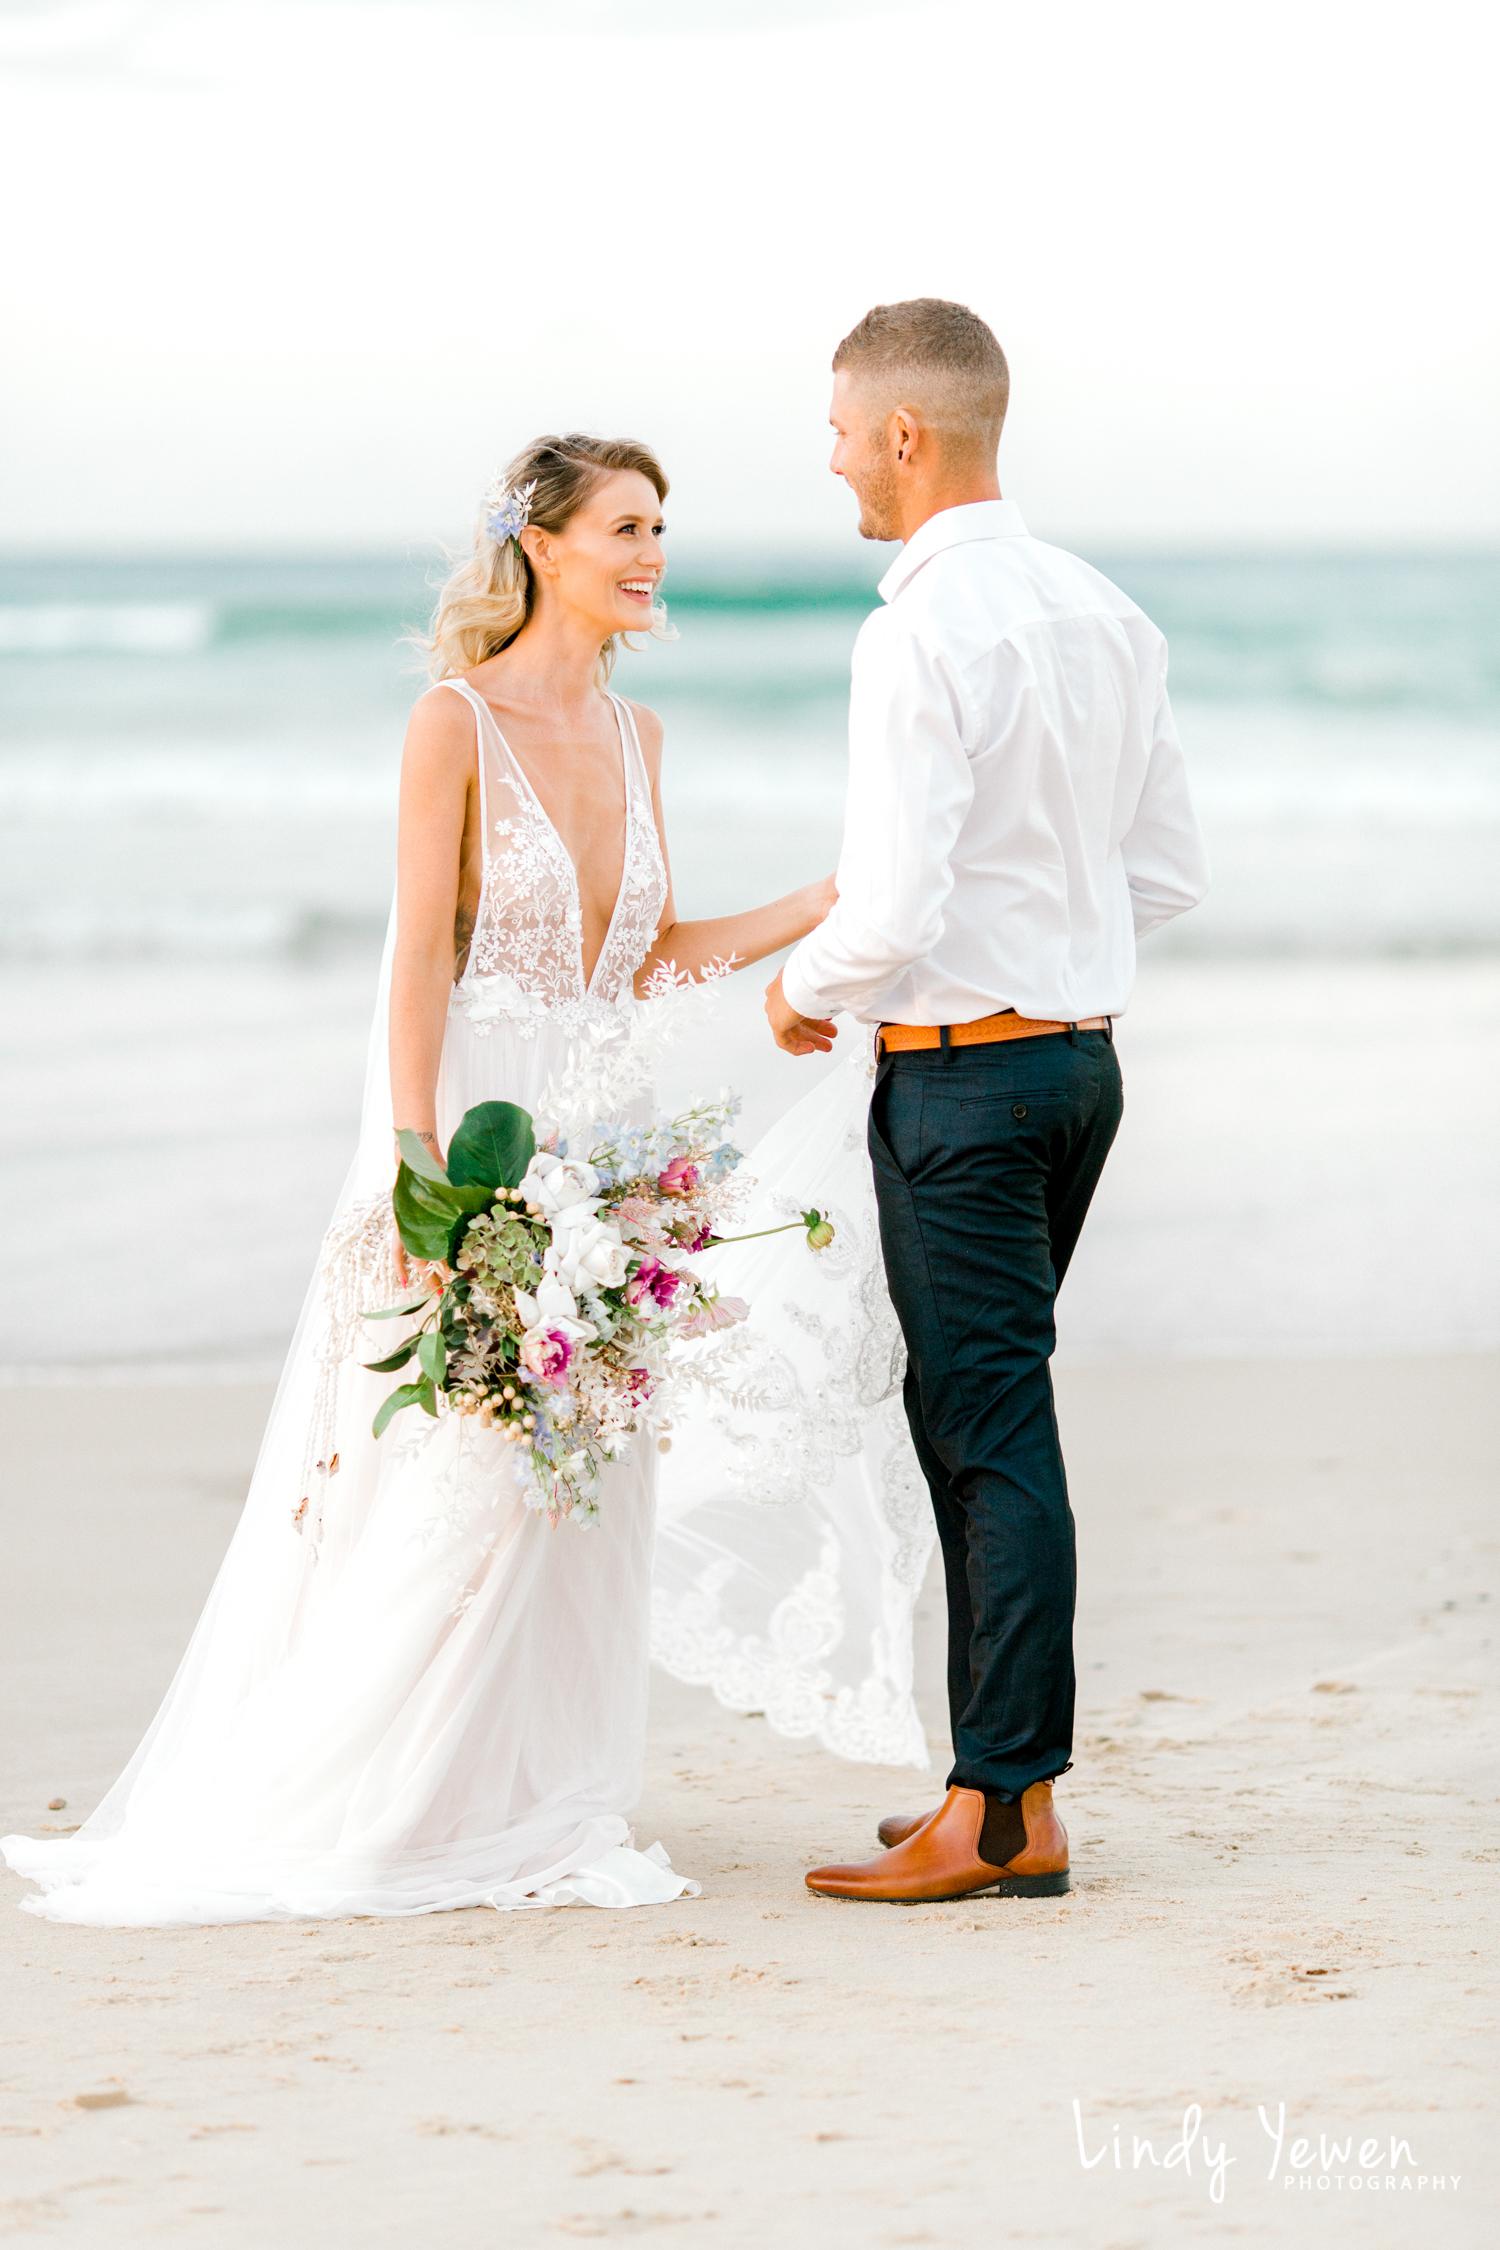 Lindy-Photography-Noosa-Weddings-Grace-Chris 261.jpg